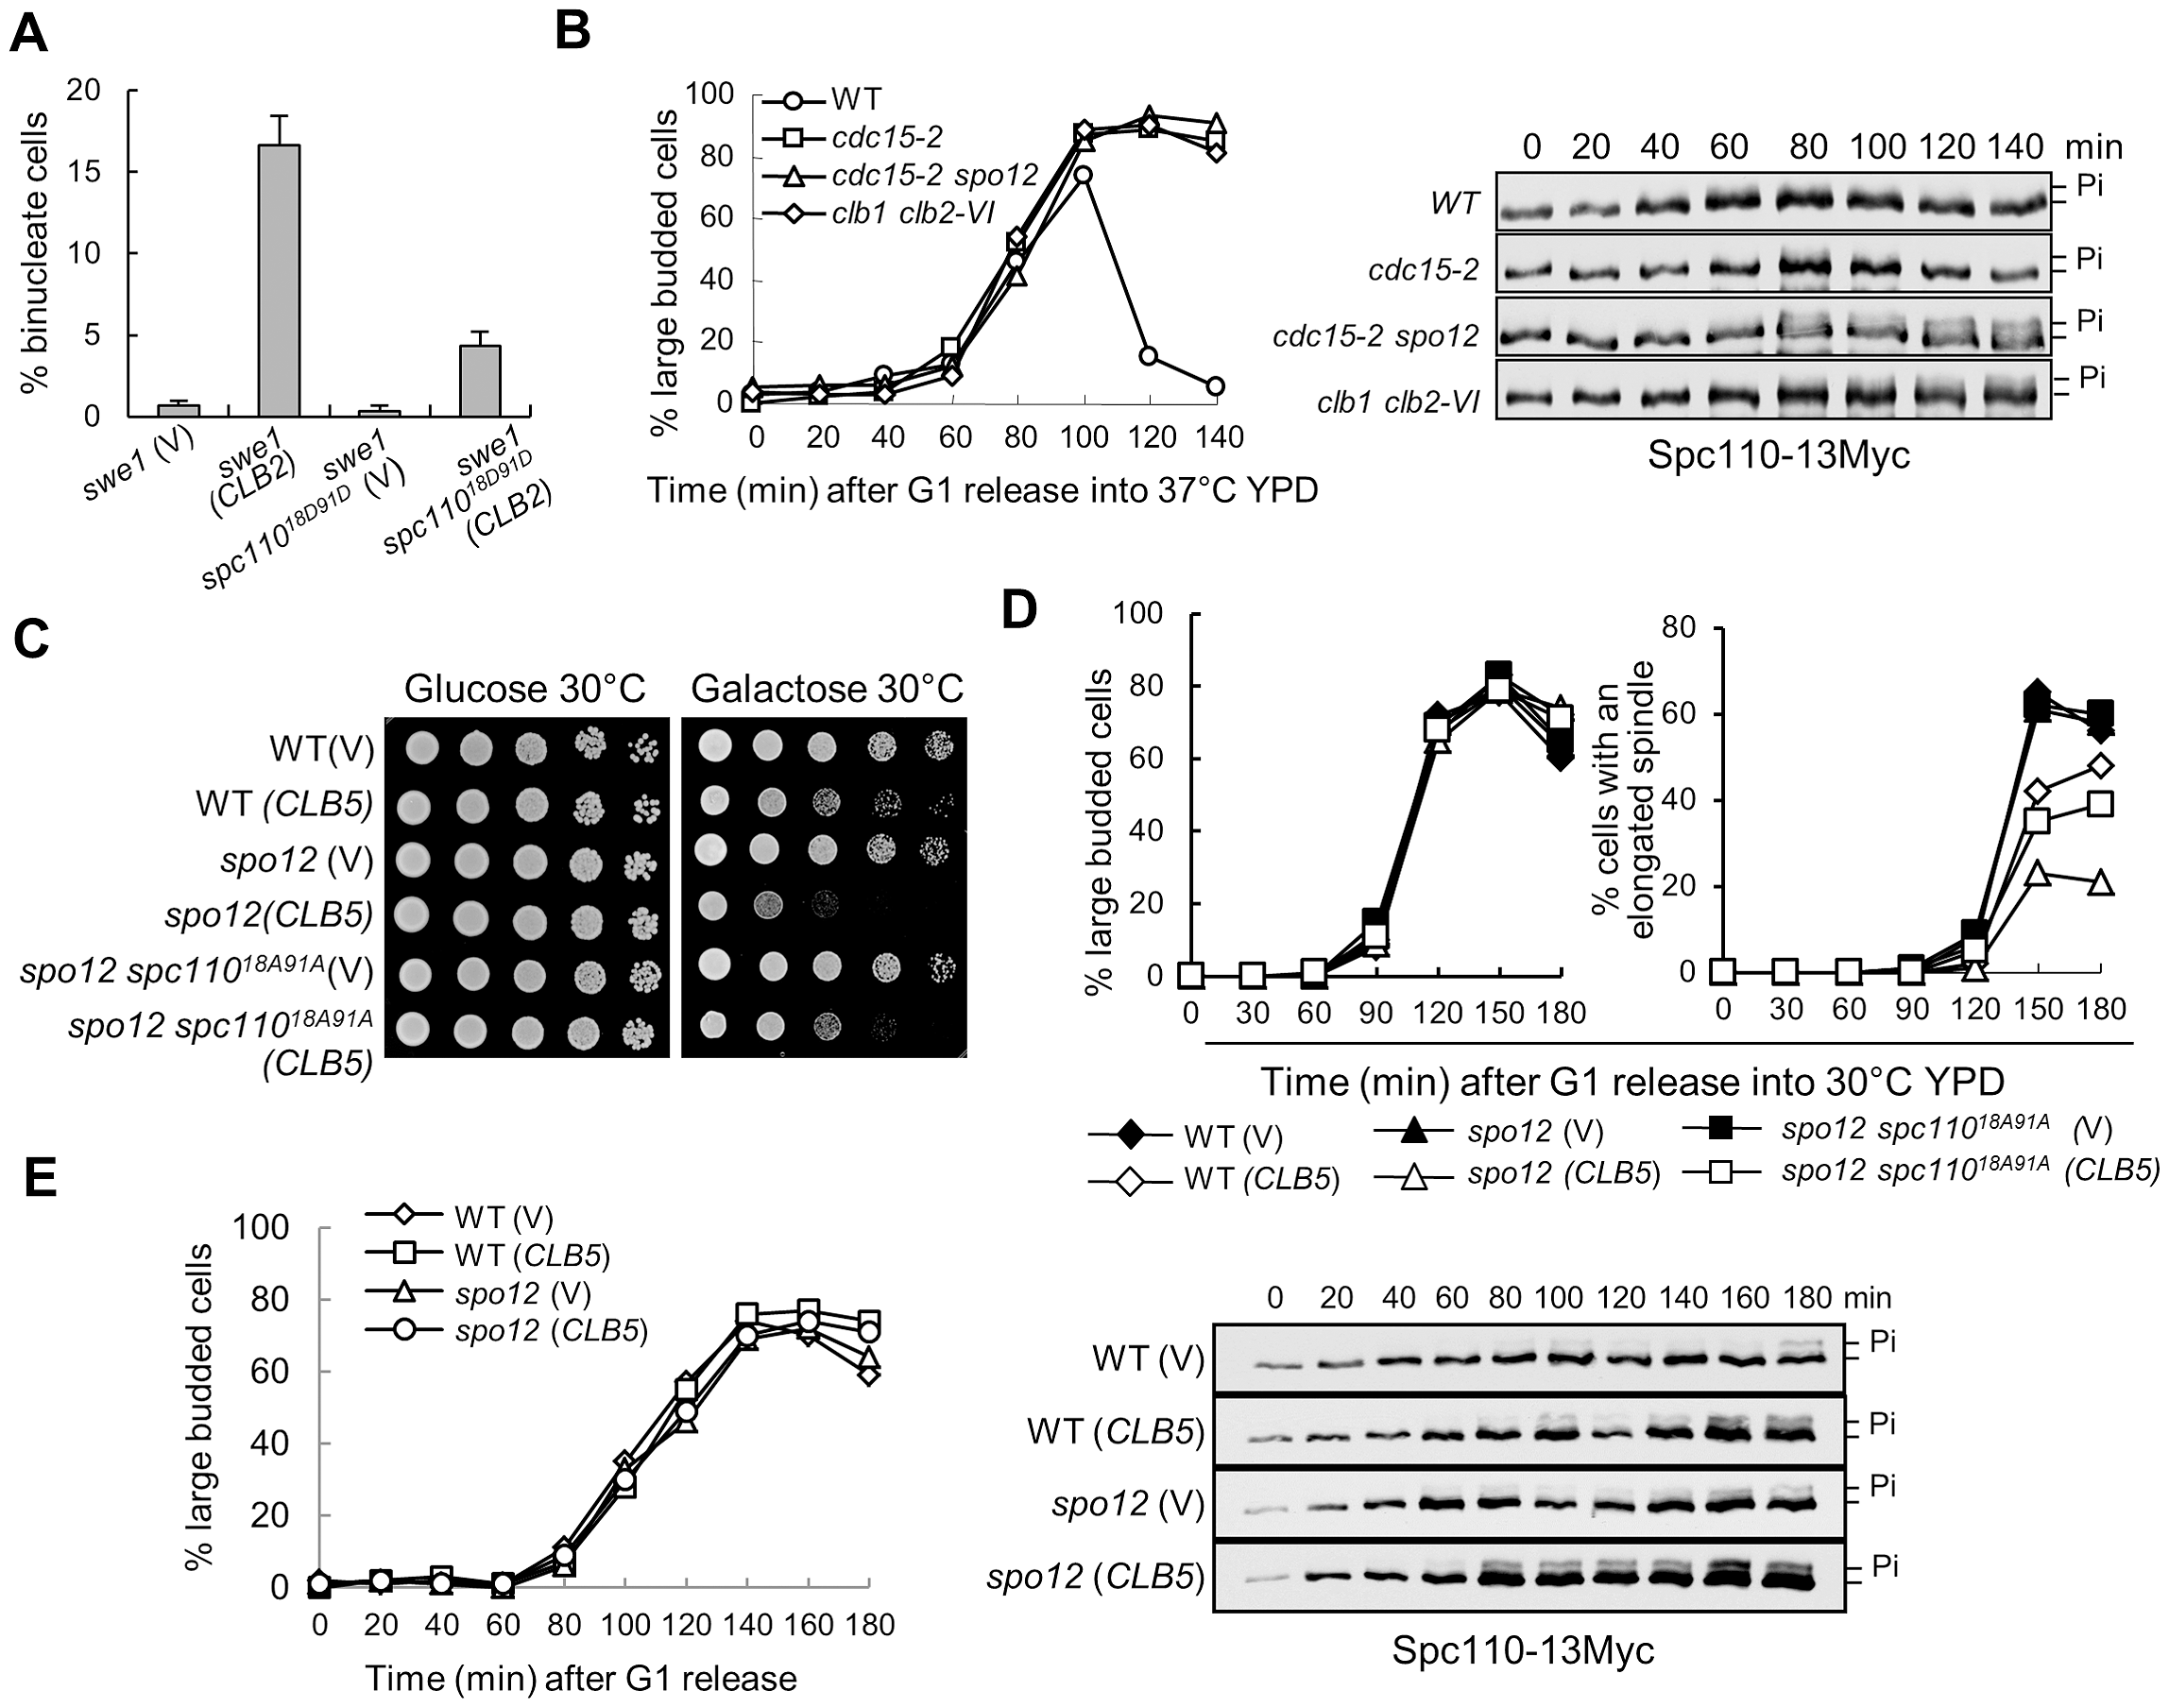 The dephosphorylation of Spc110 promotes spindle elongation.